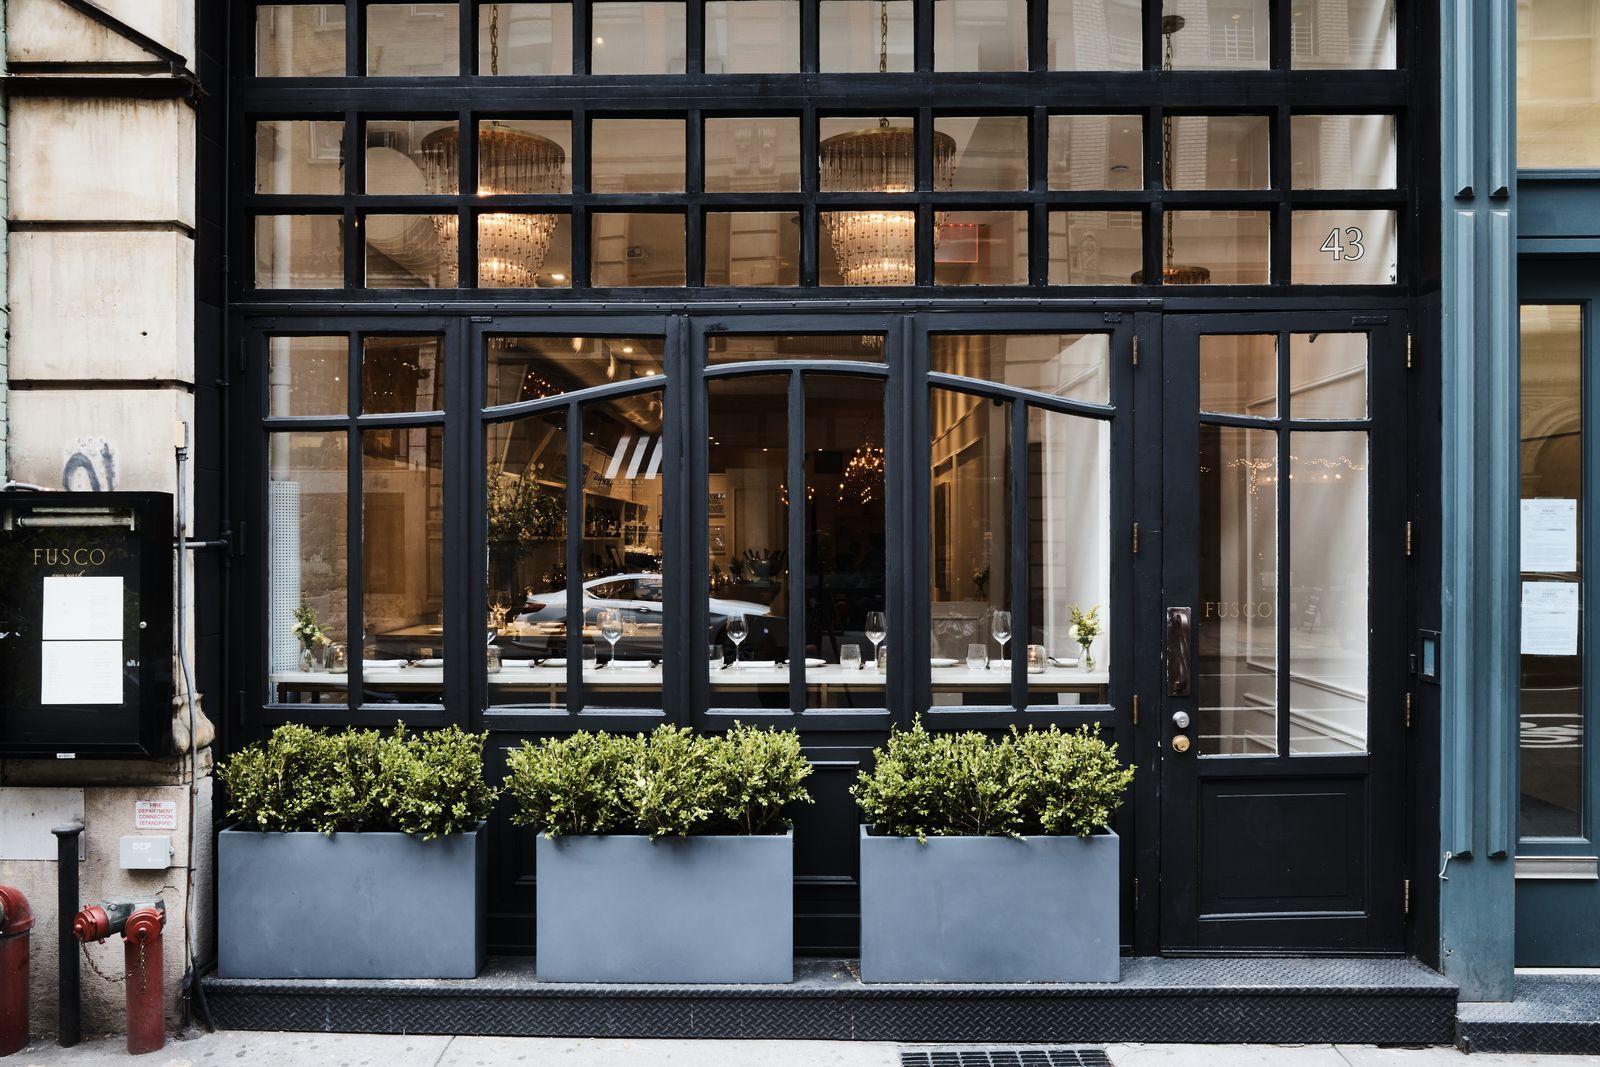 Fusco Flatiron Nyc Scott Conant S New Independent Italian Restaurant Now Open